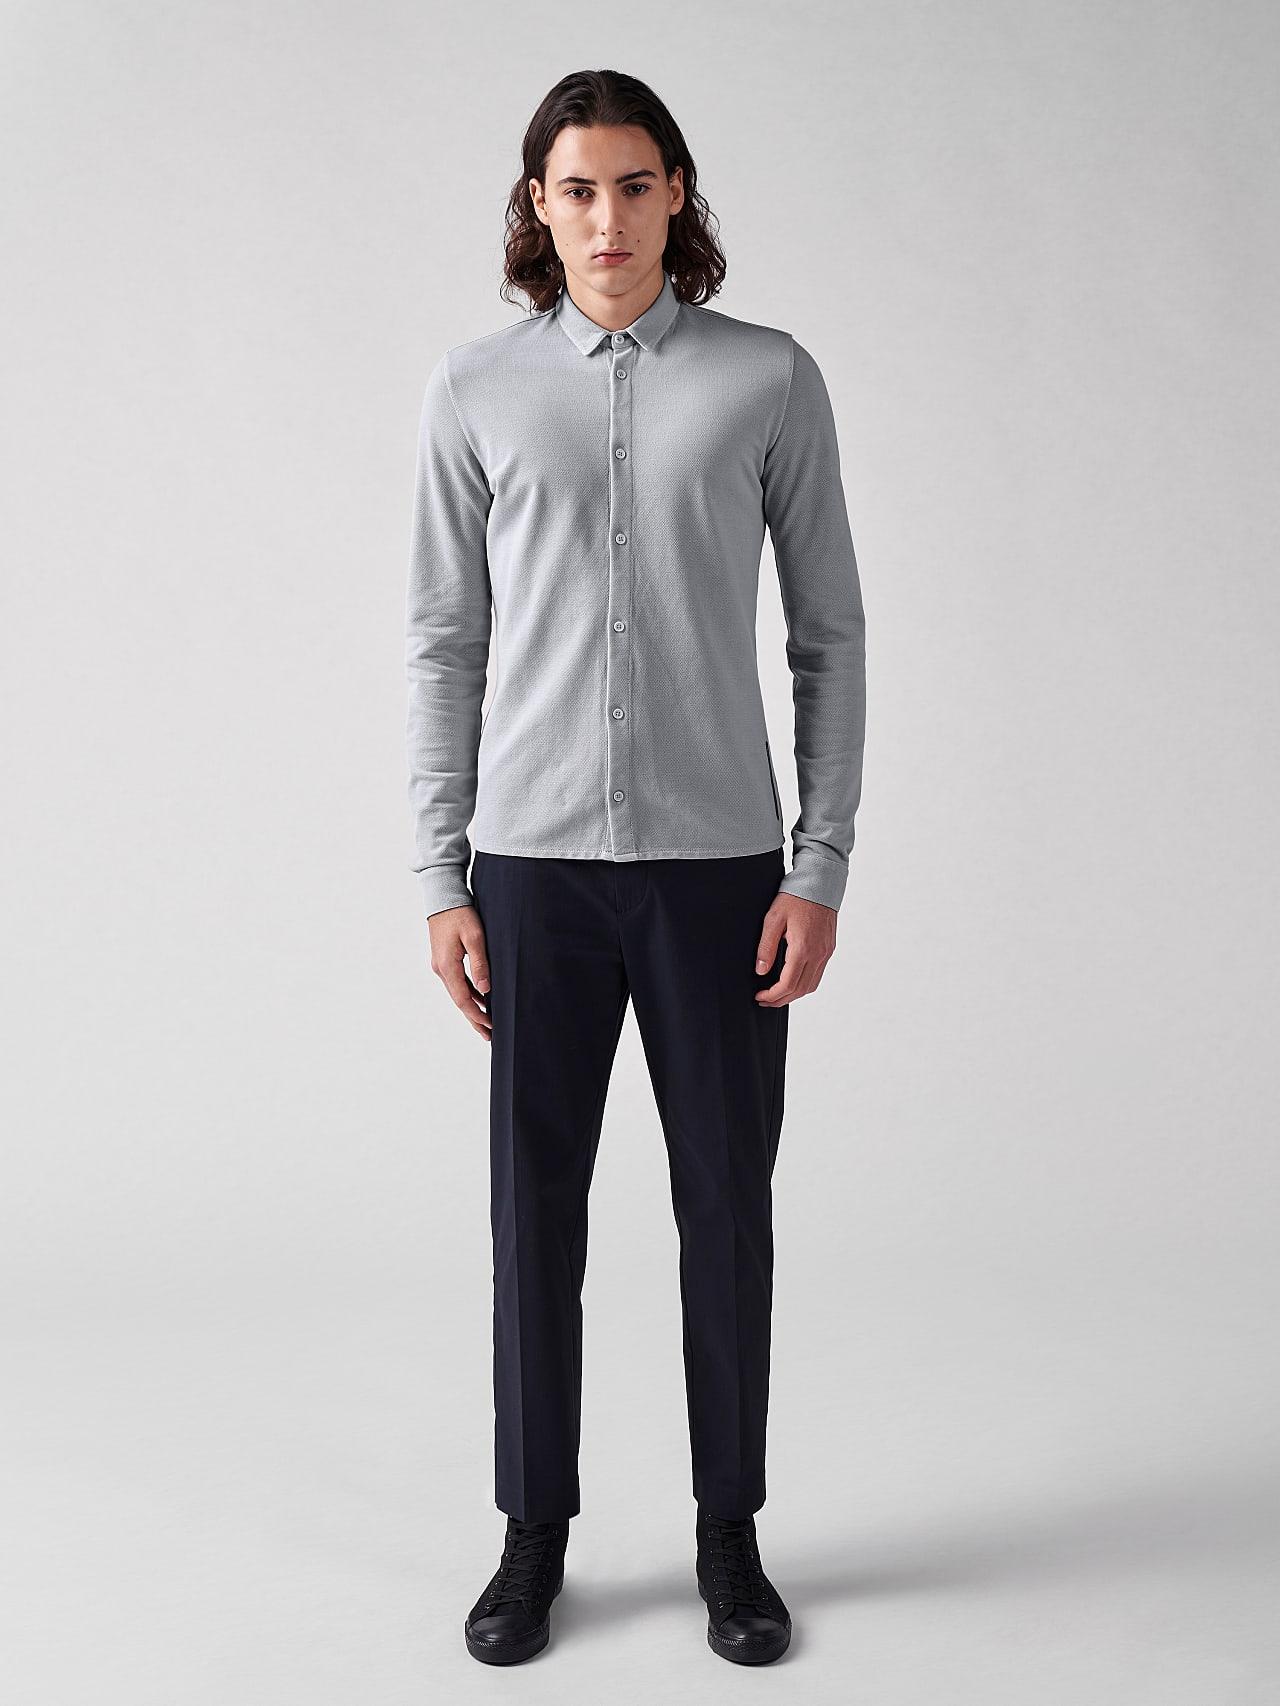 JIQUE V1.Y5.01 Pique Shirt with Kent Collar light grey Front Alpha Tauri